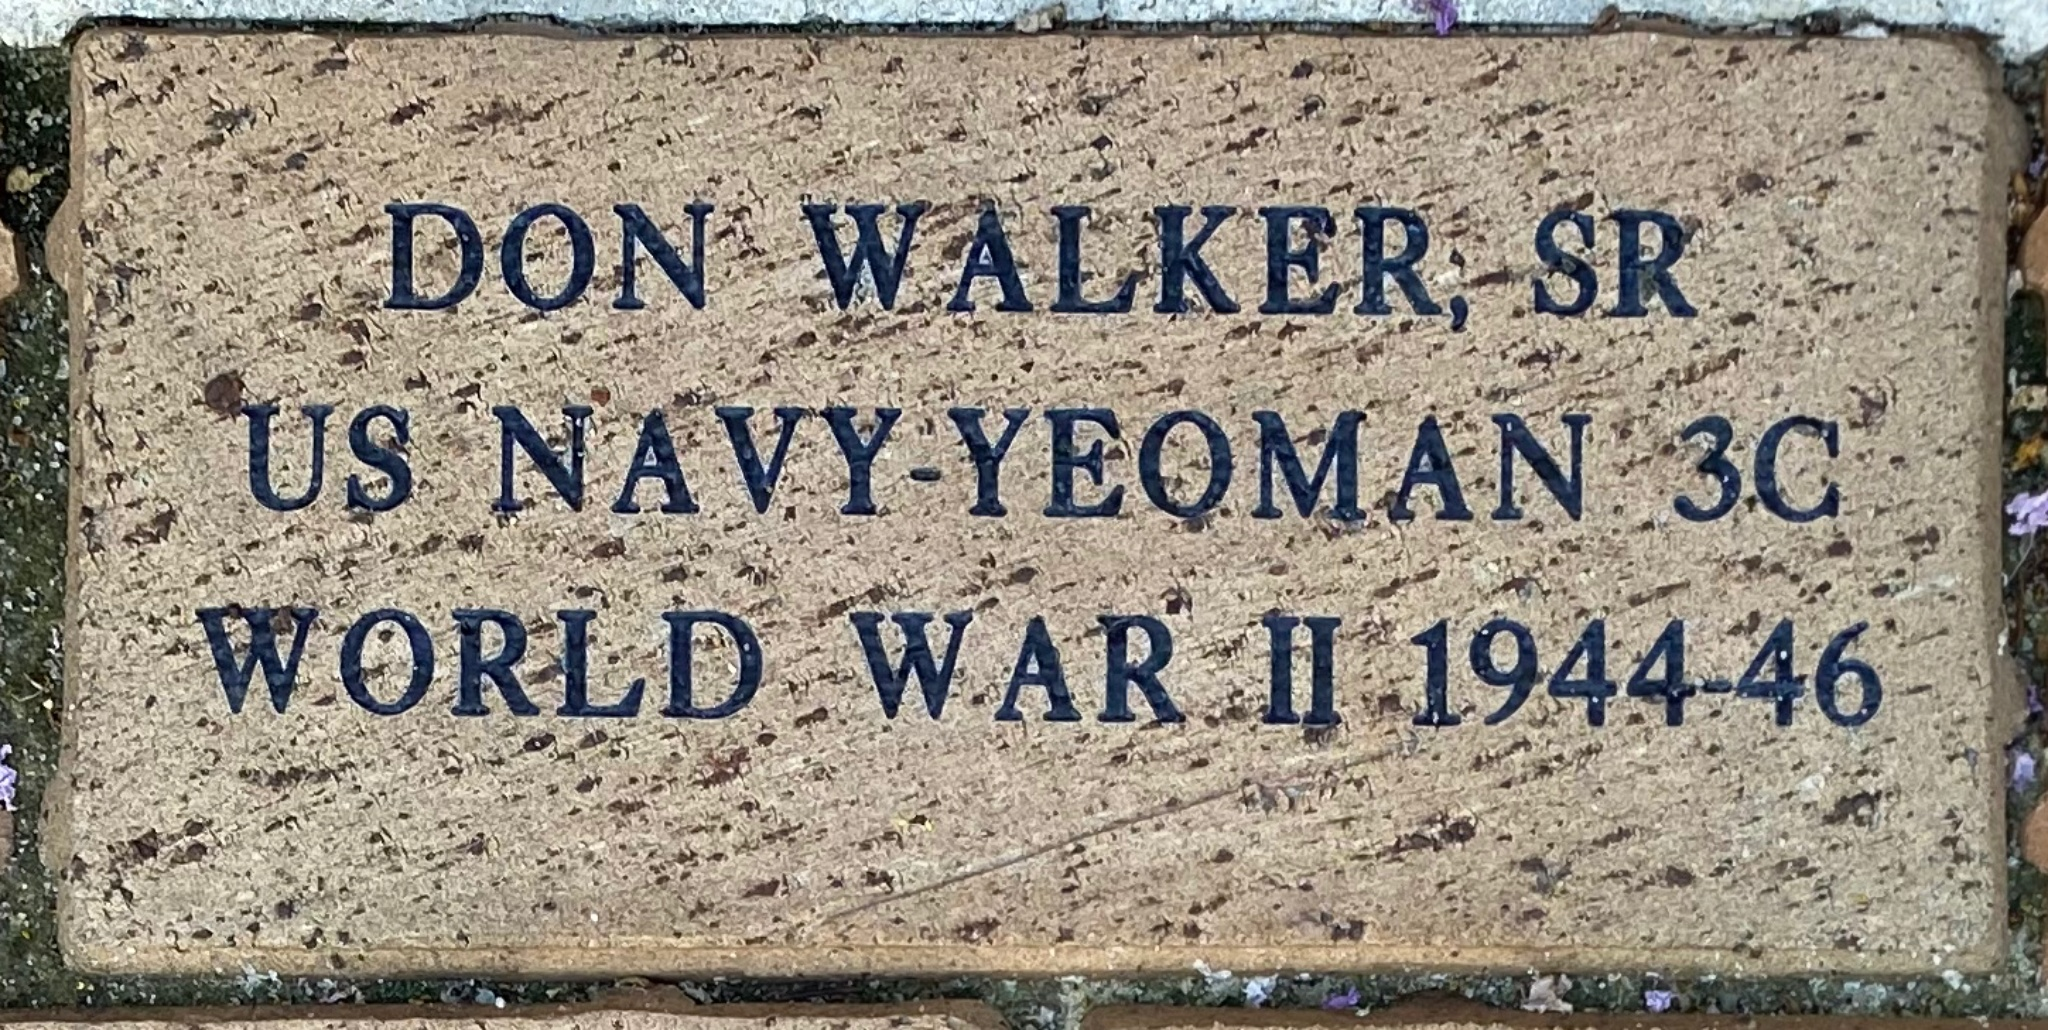 DON WALKER, SR US NAVY-YEOMAN 3C WORLD WAR 11 1944-46